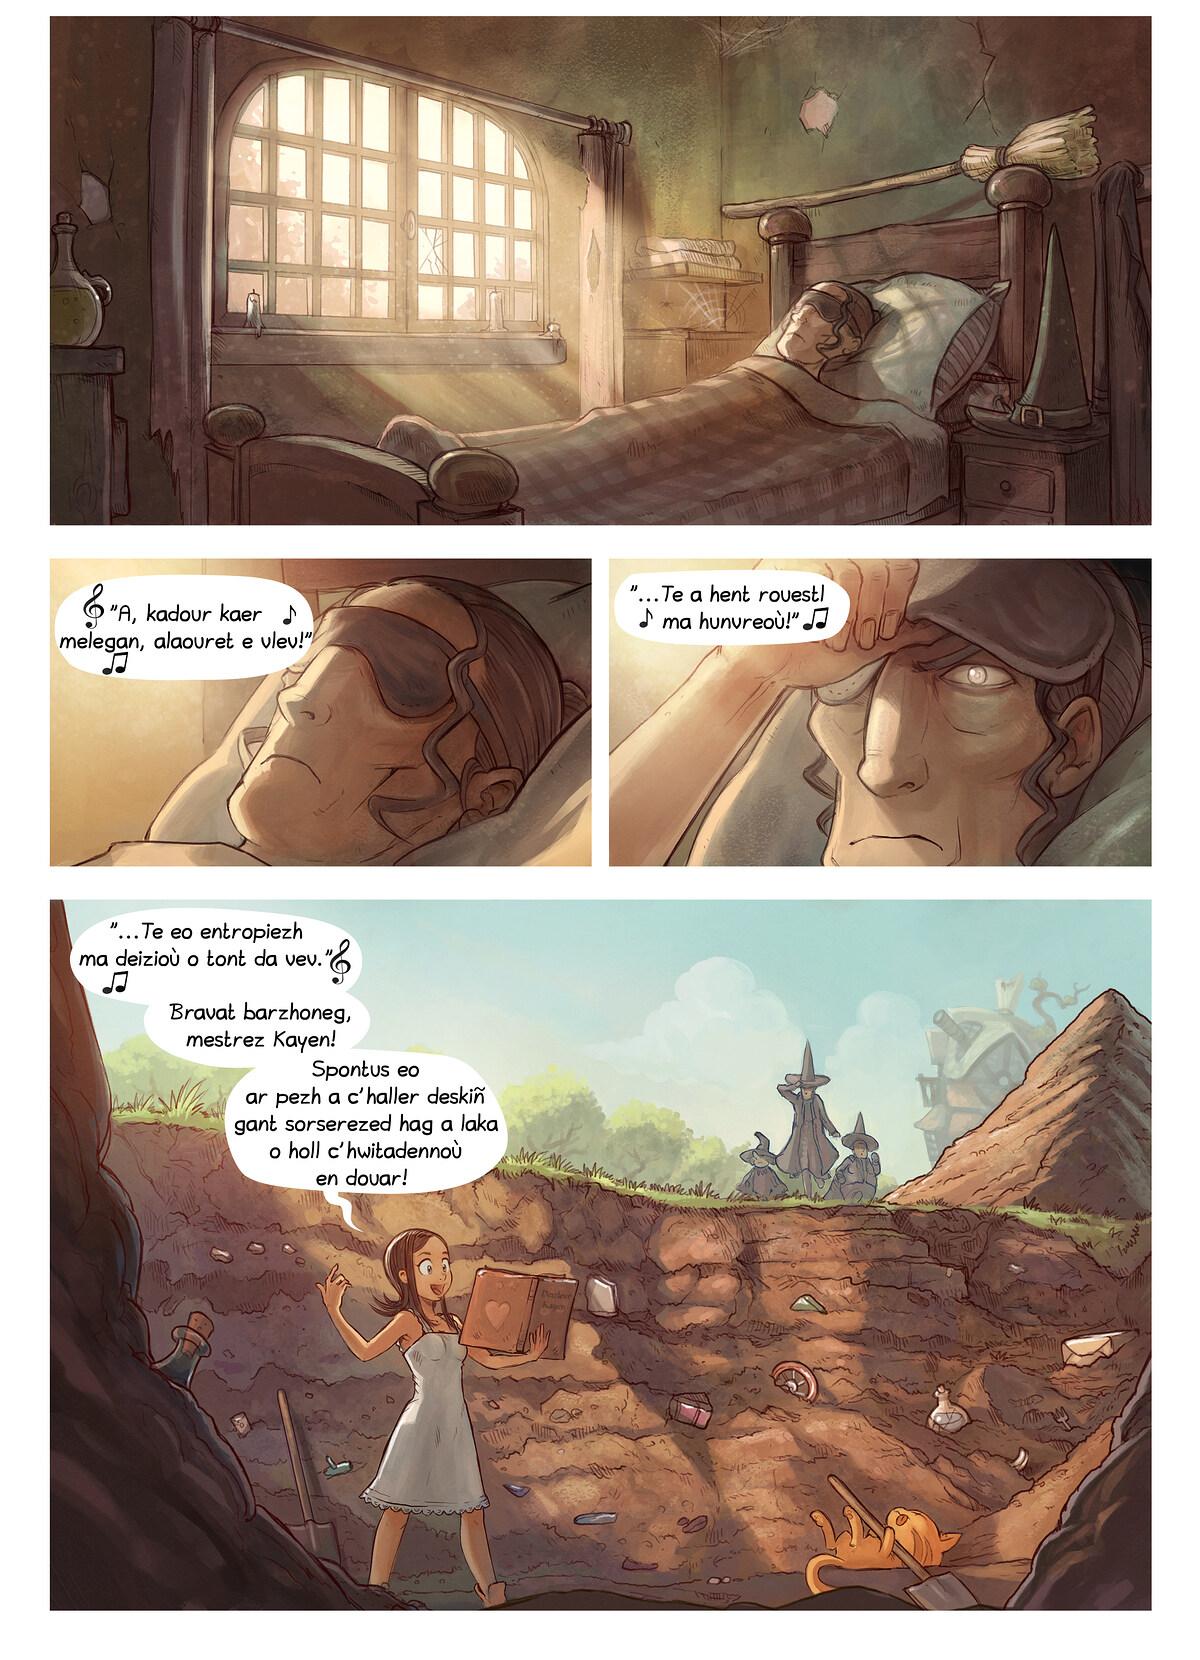 A webcomic page of Pepper&Carrot, rann 19 [br], pajenn 4